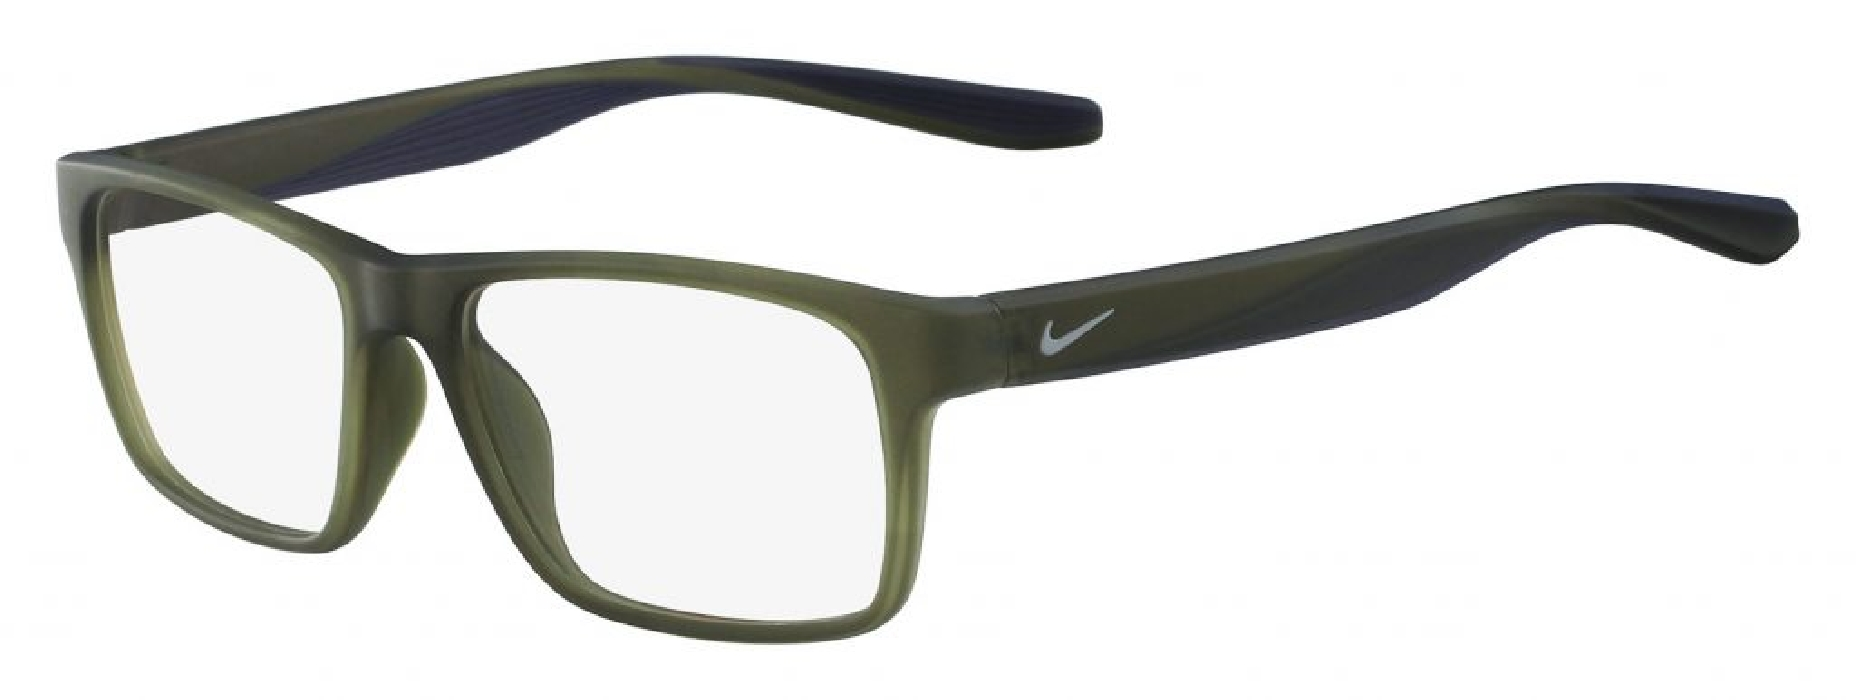 An image of Nike 7101 Matte Cargo Khaki